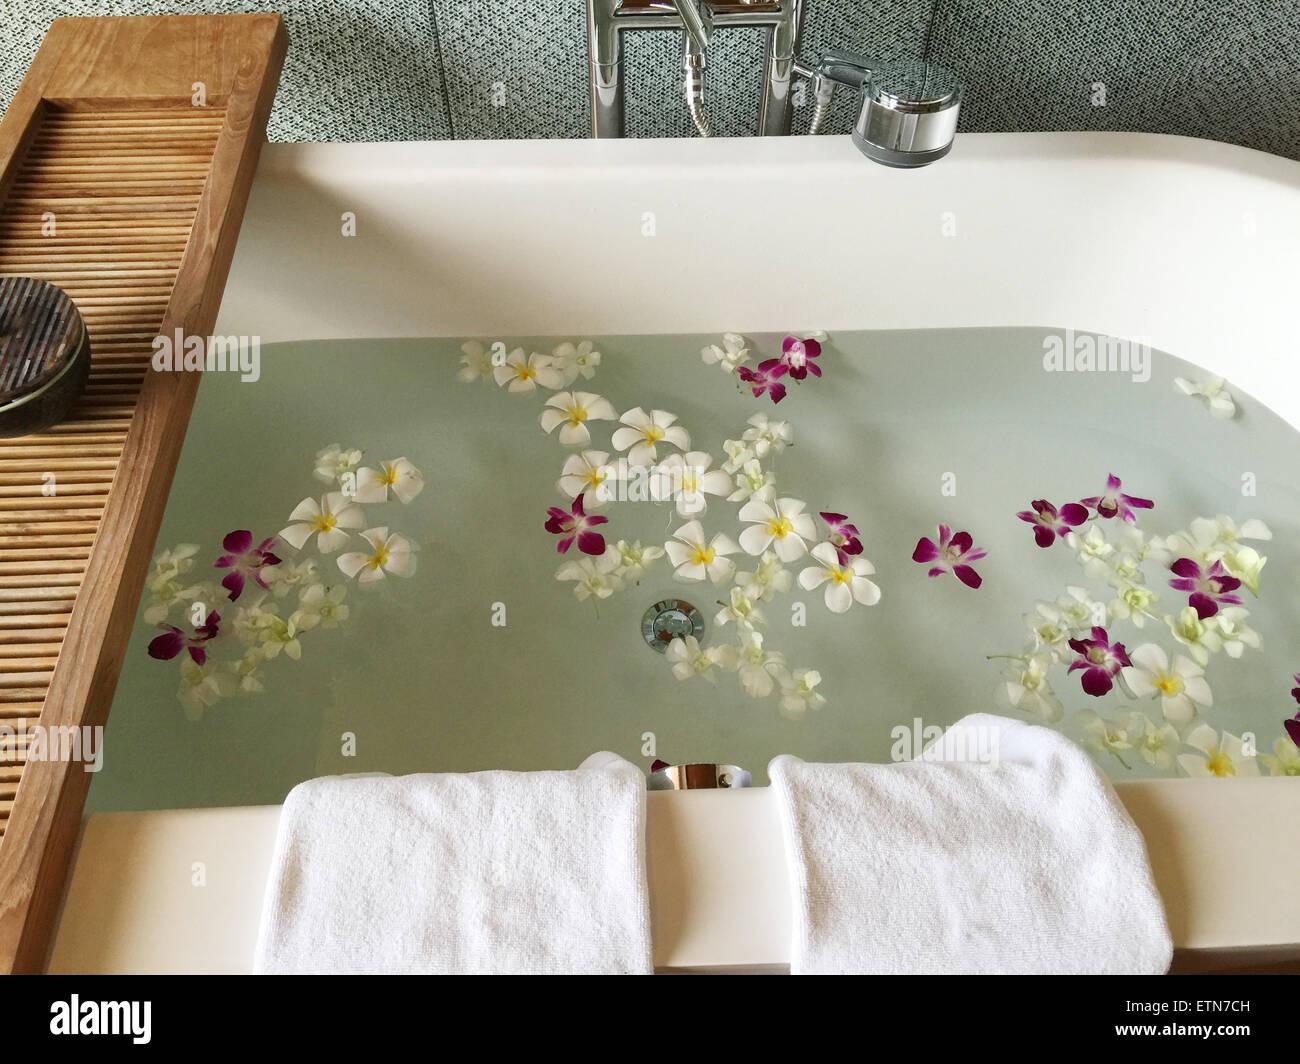 Frangipani flowers floating in a bath tub - Stock Image